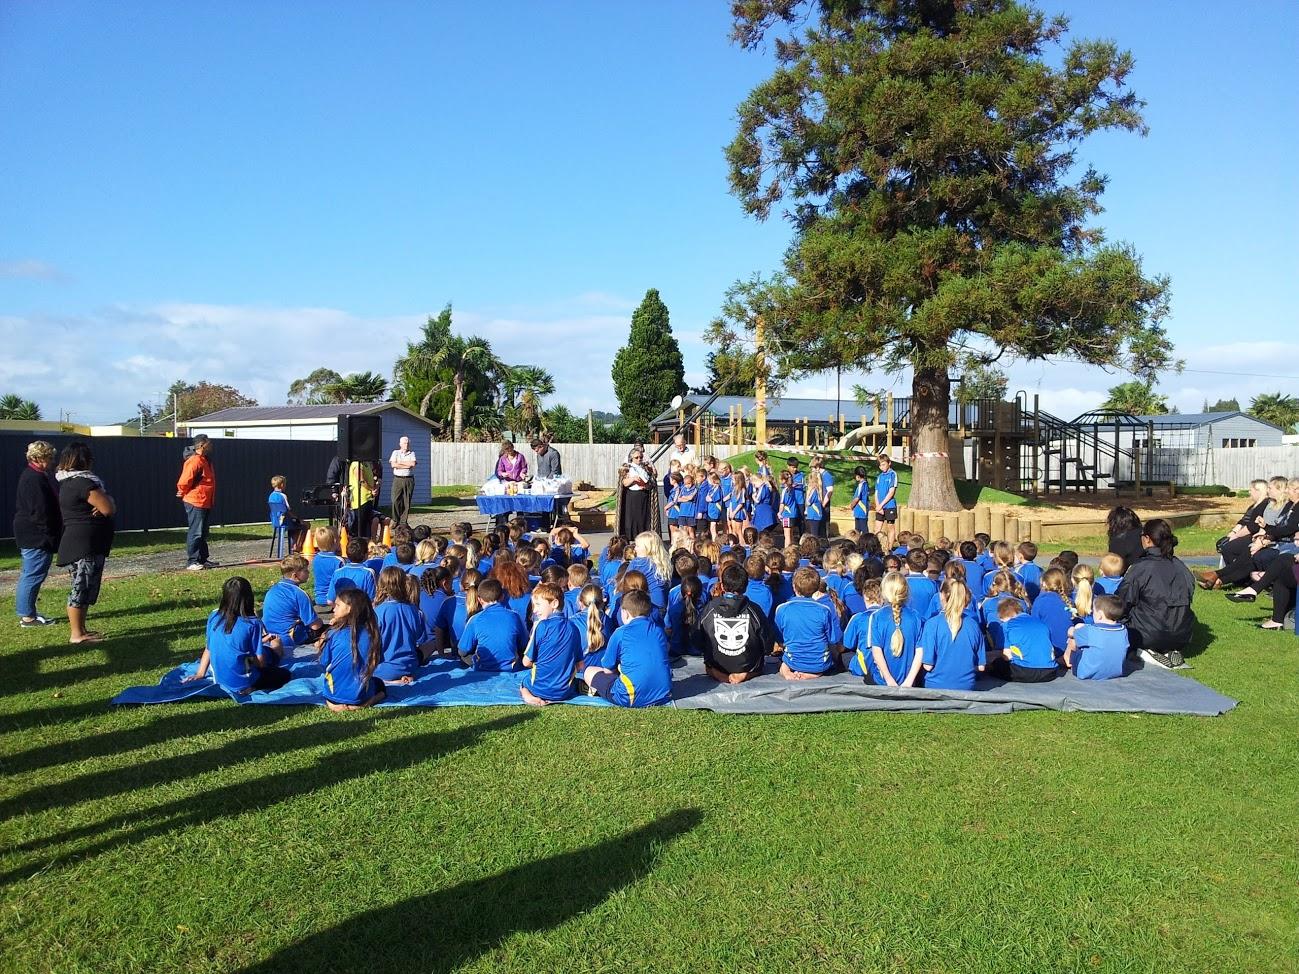 Waihi East Community Green Space/Playground